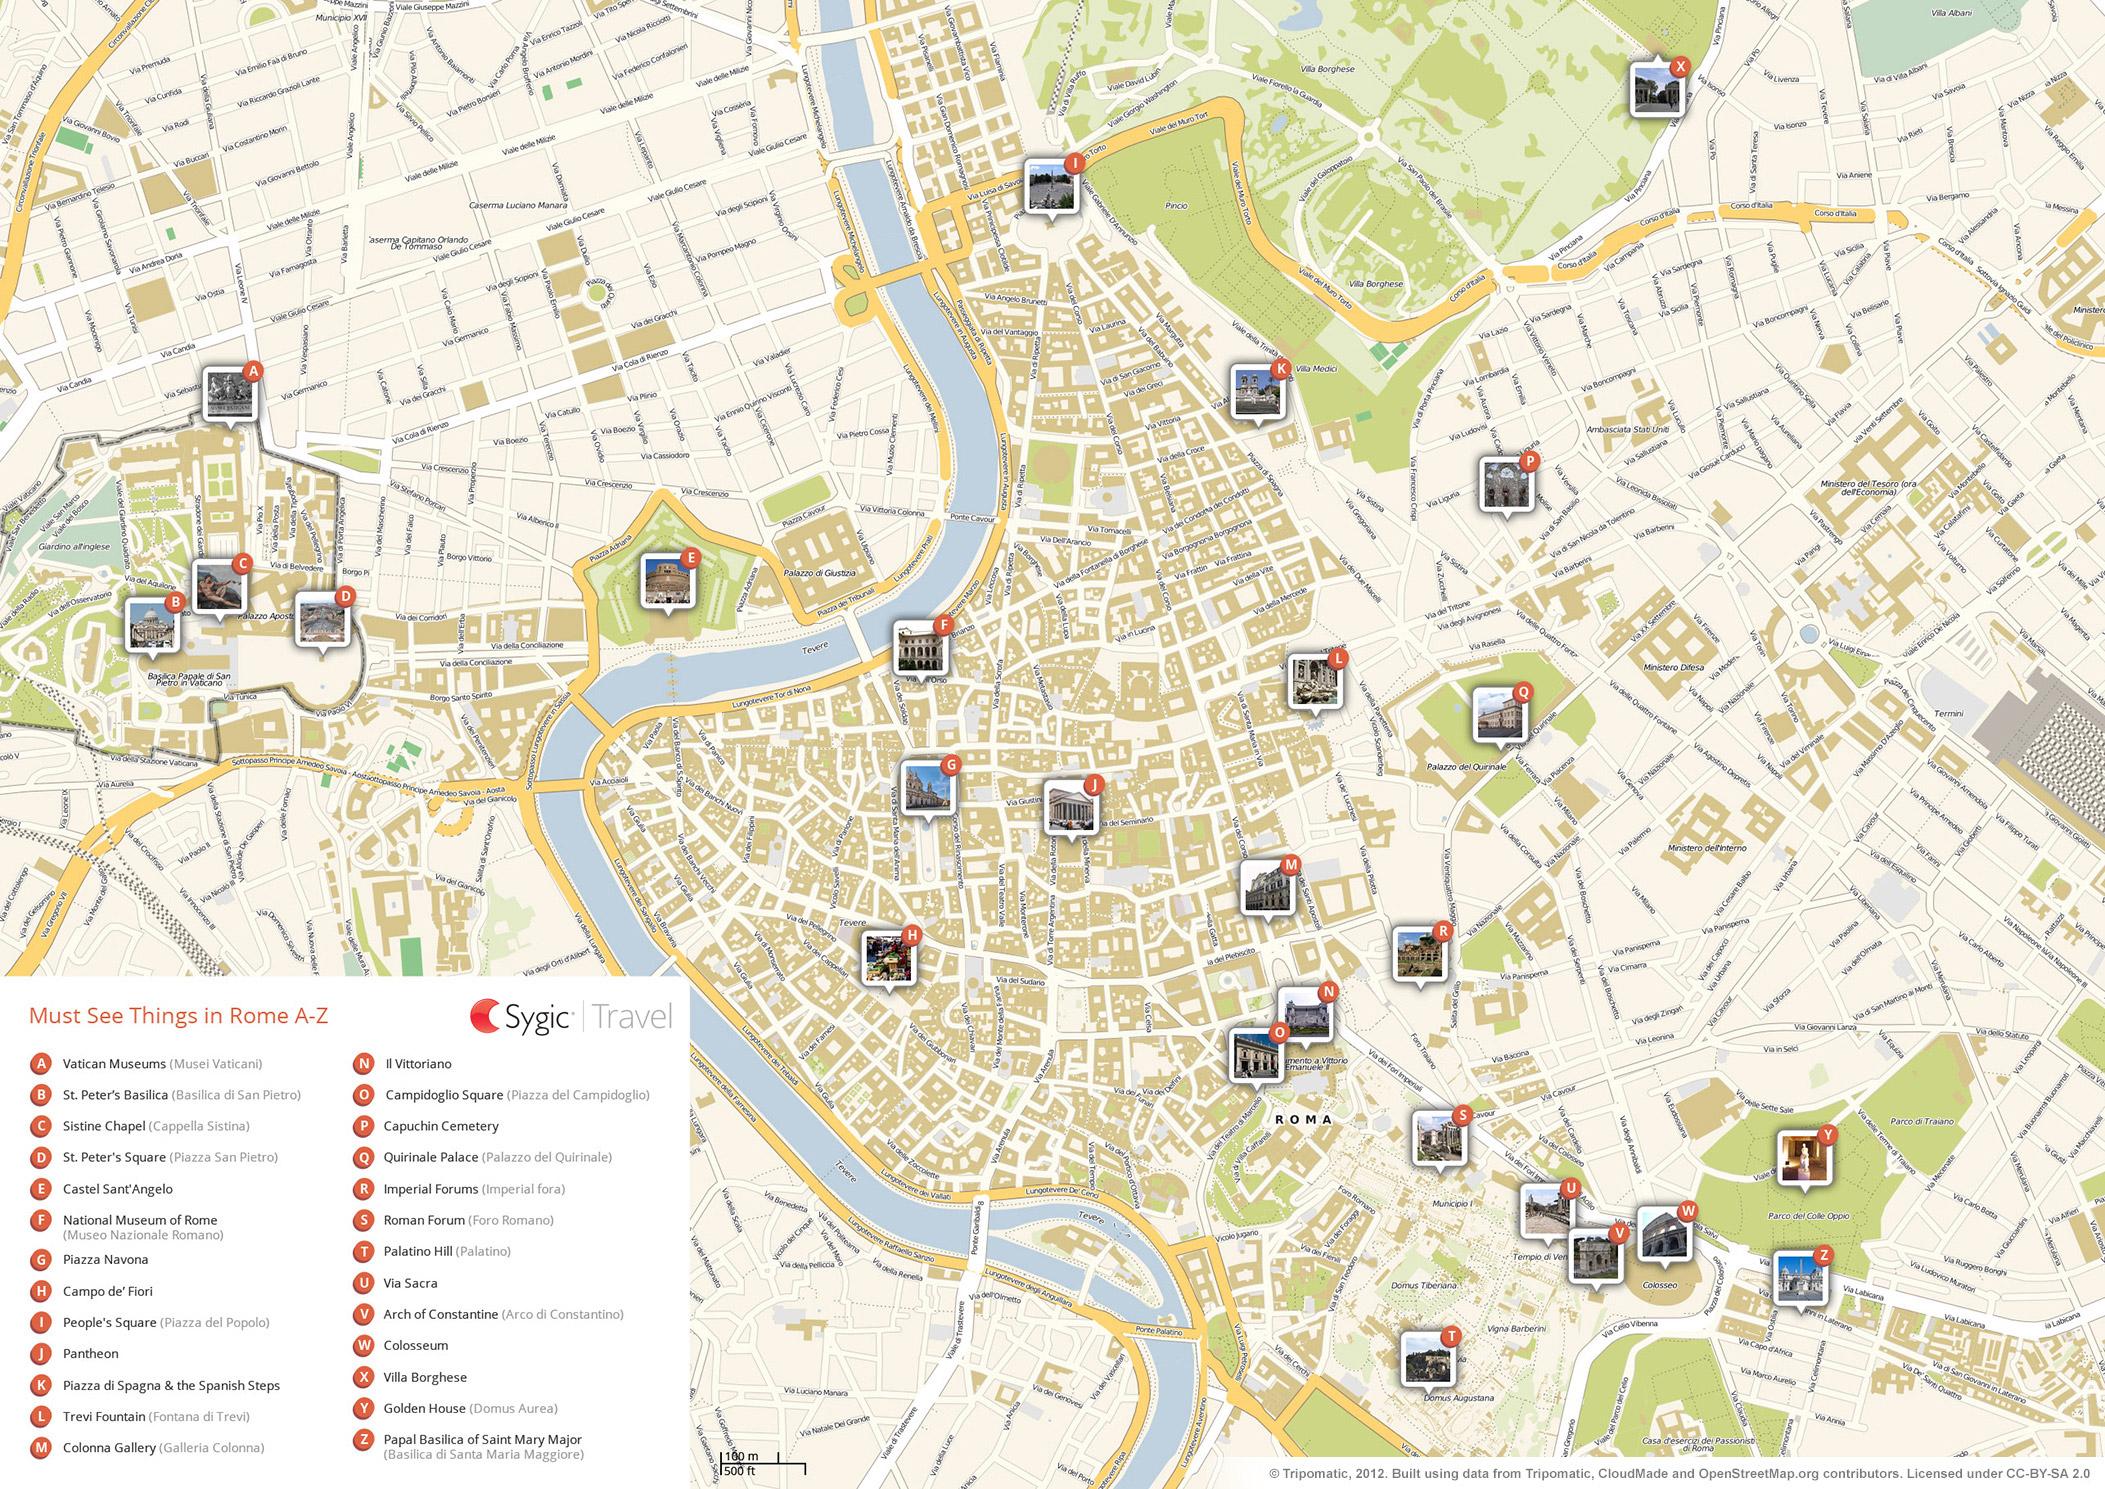 Rome Printable Tourist Map   Sygic Travel - Printable Map Of Rome